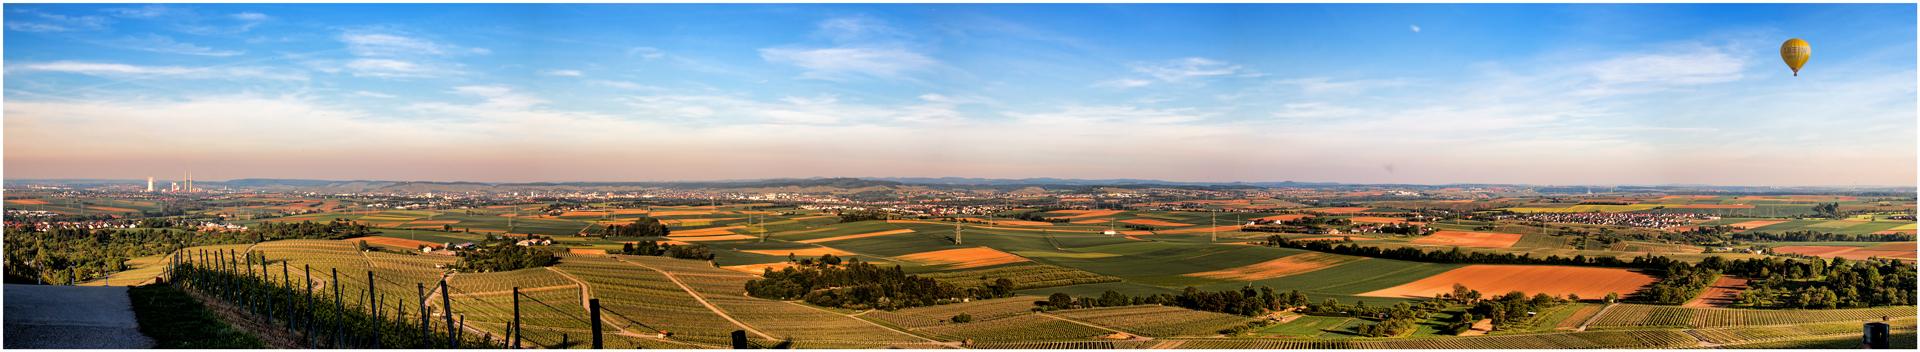 Blick über das Heilbronner Land